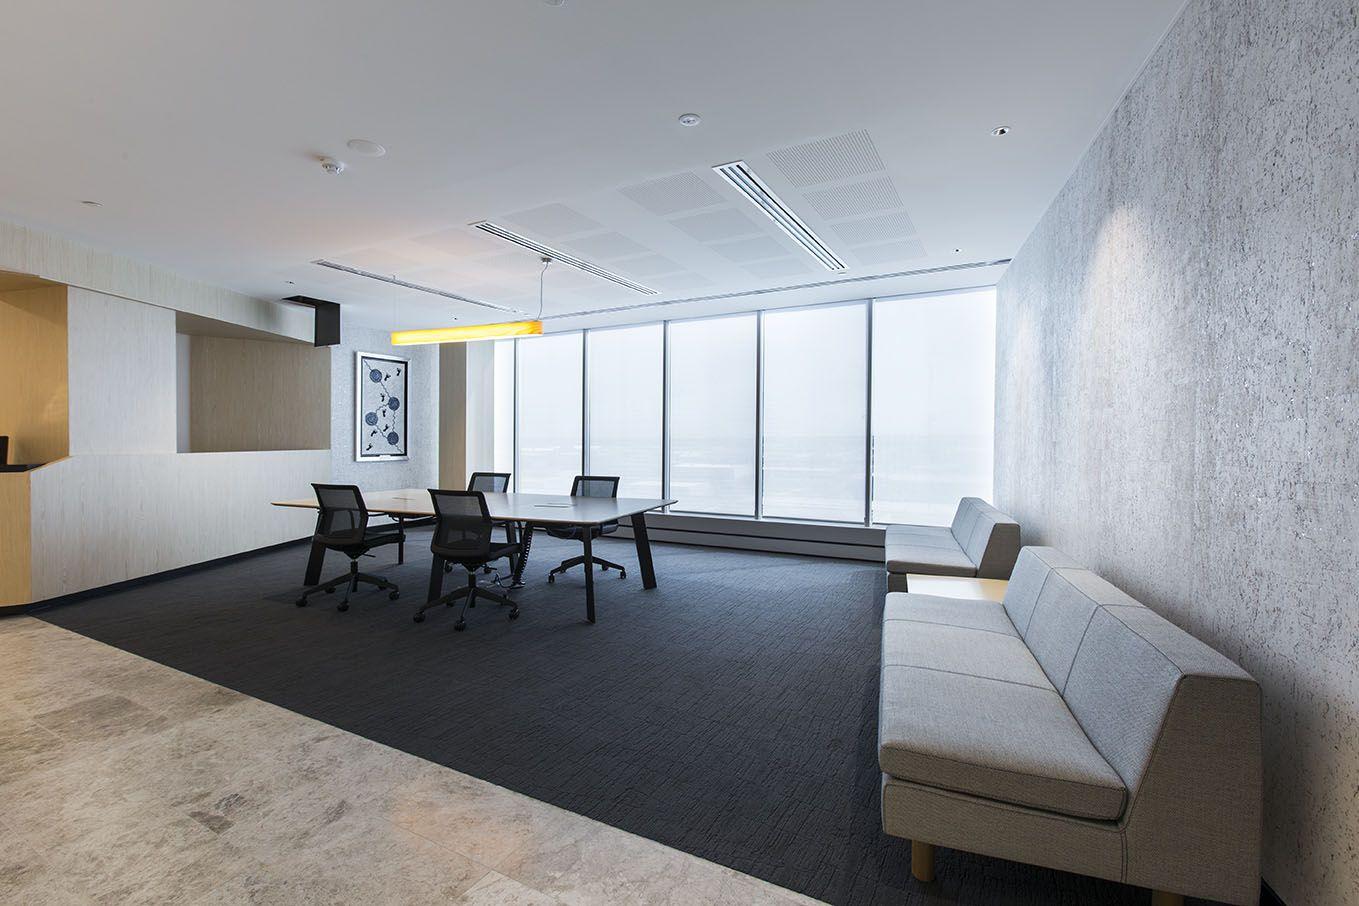 Mkdc Dept Of Education Services Hot Desk Commercial Interior Design Commercial Interiors Interior Architecture